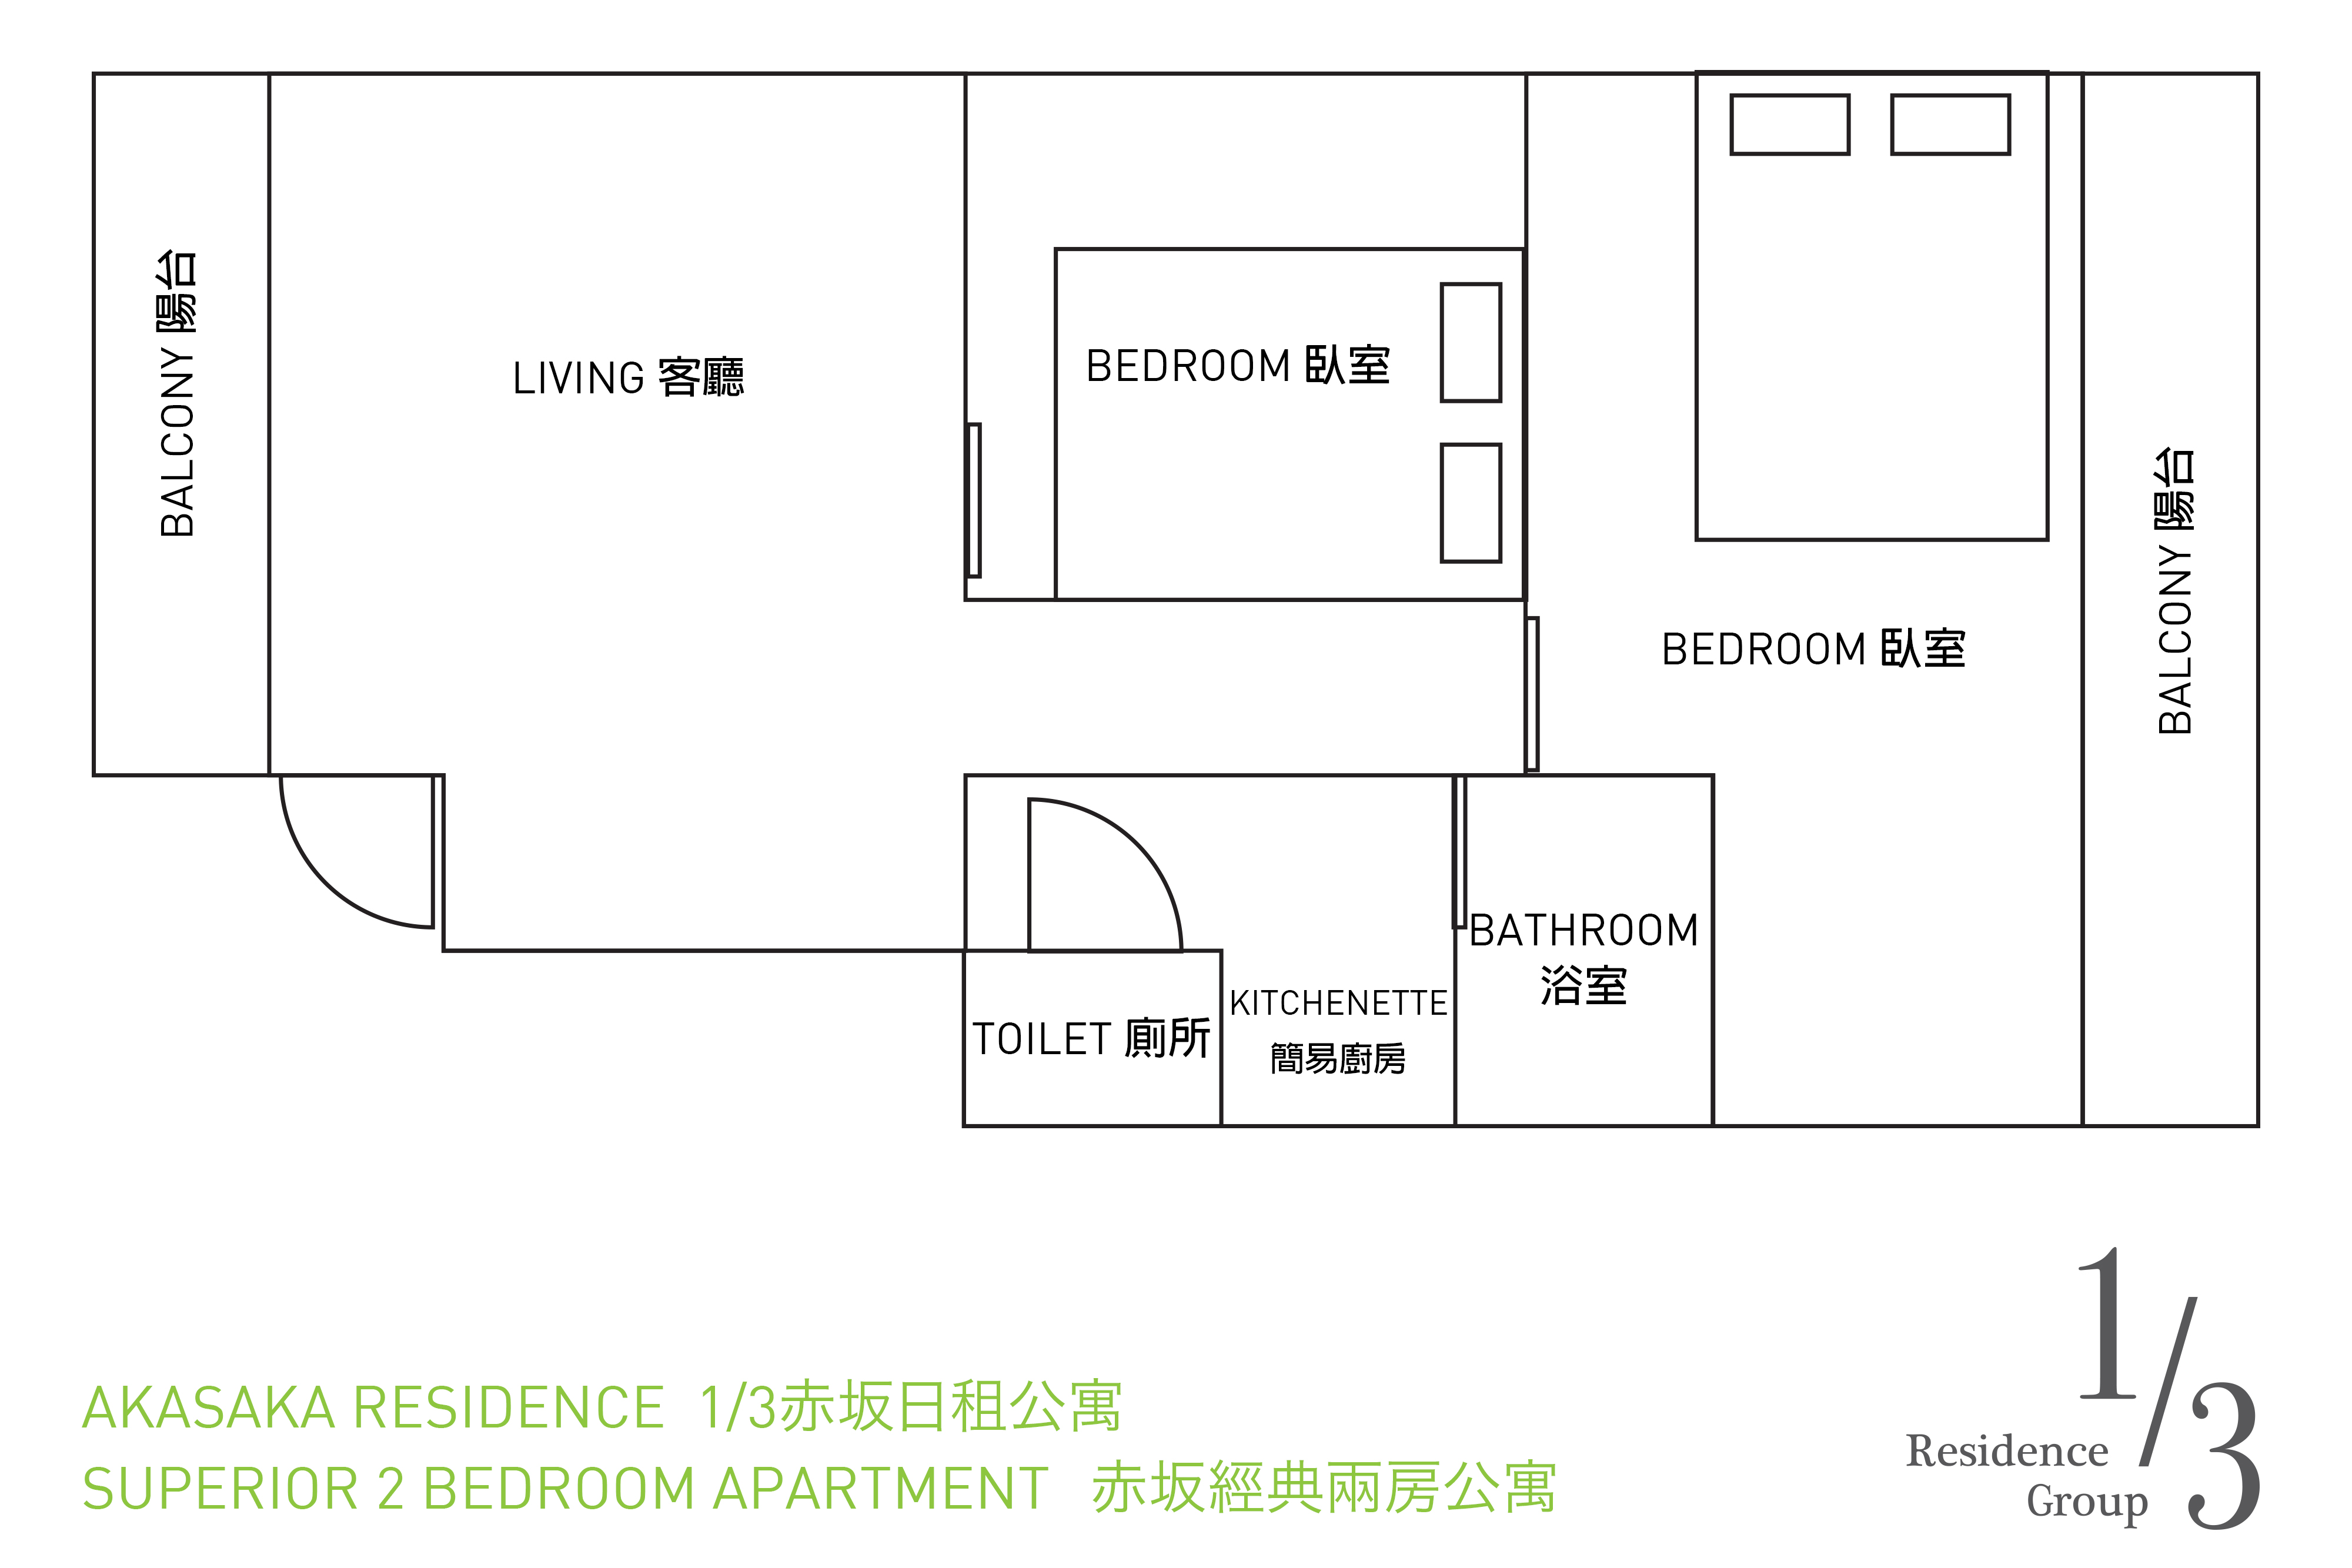 Superior 2 Bedroom Akasaka